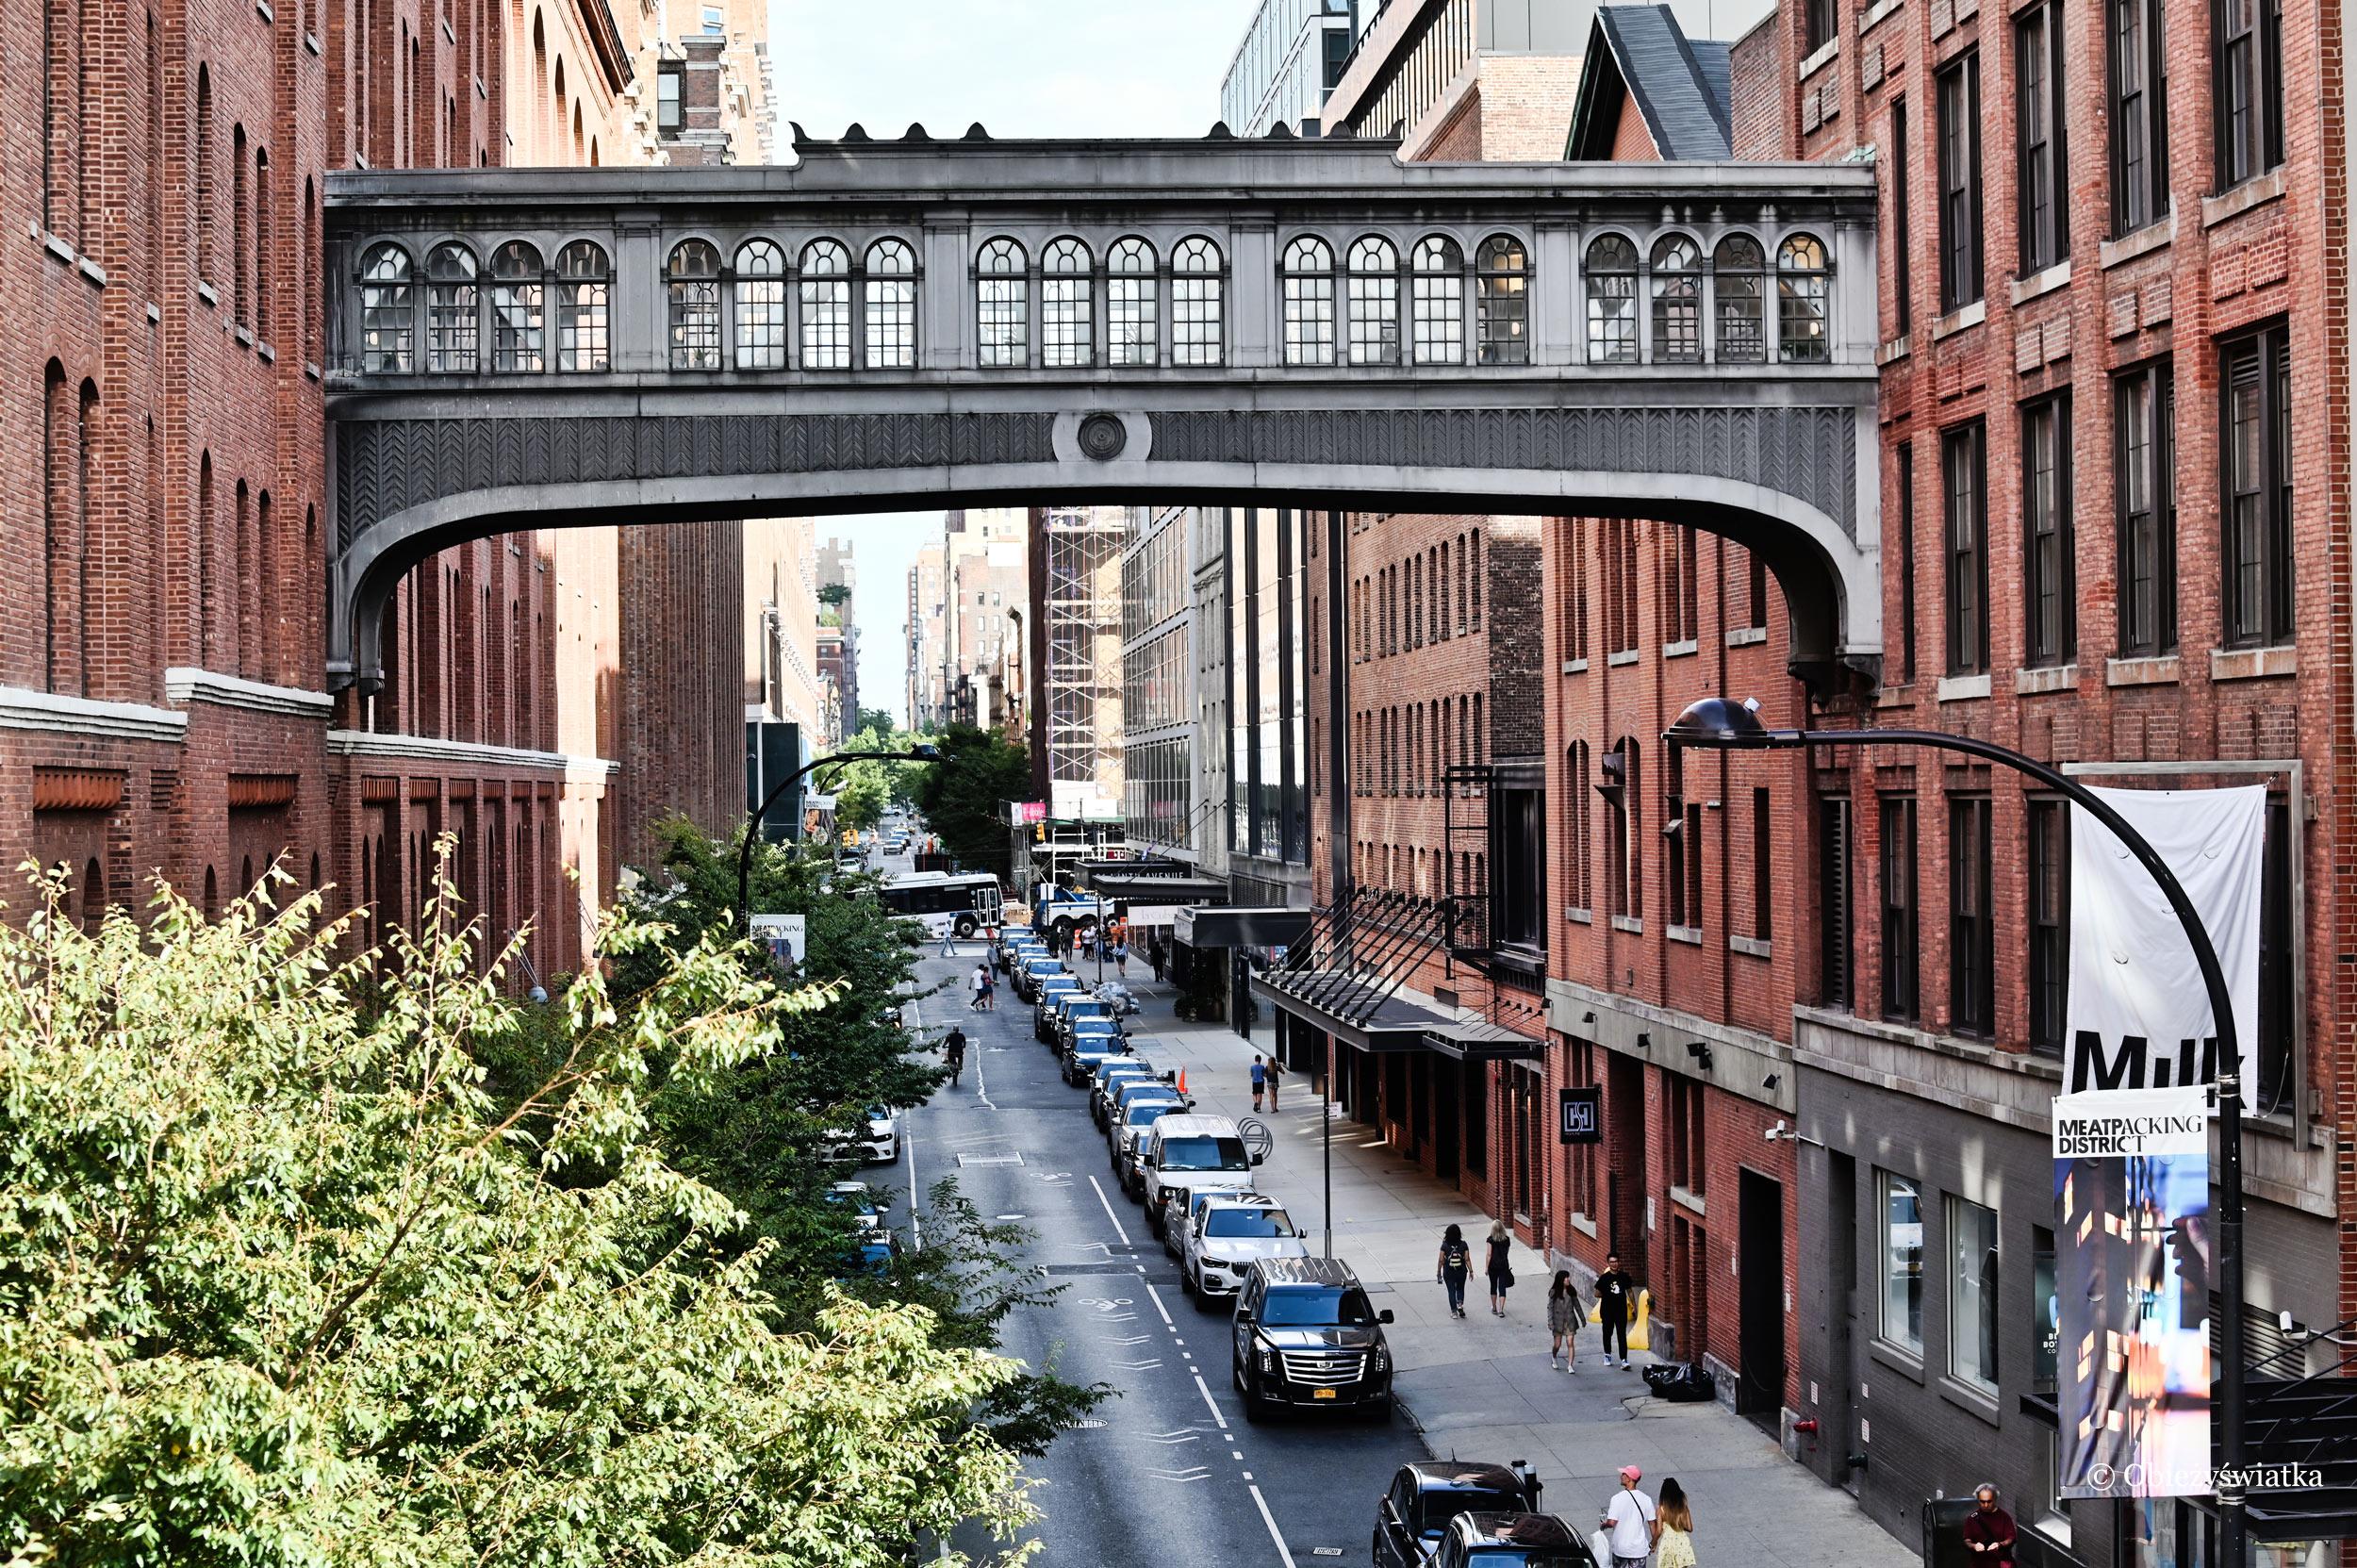 Widok z parku ponad ulicami Nowego Jorku, The High Line